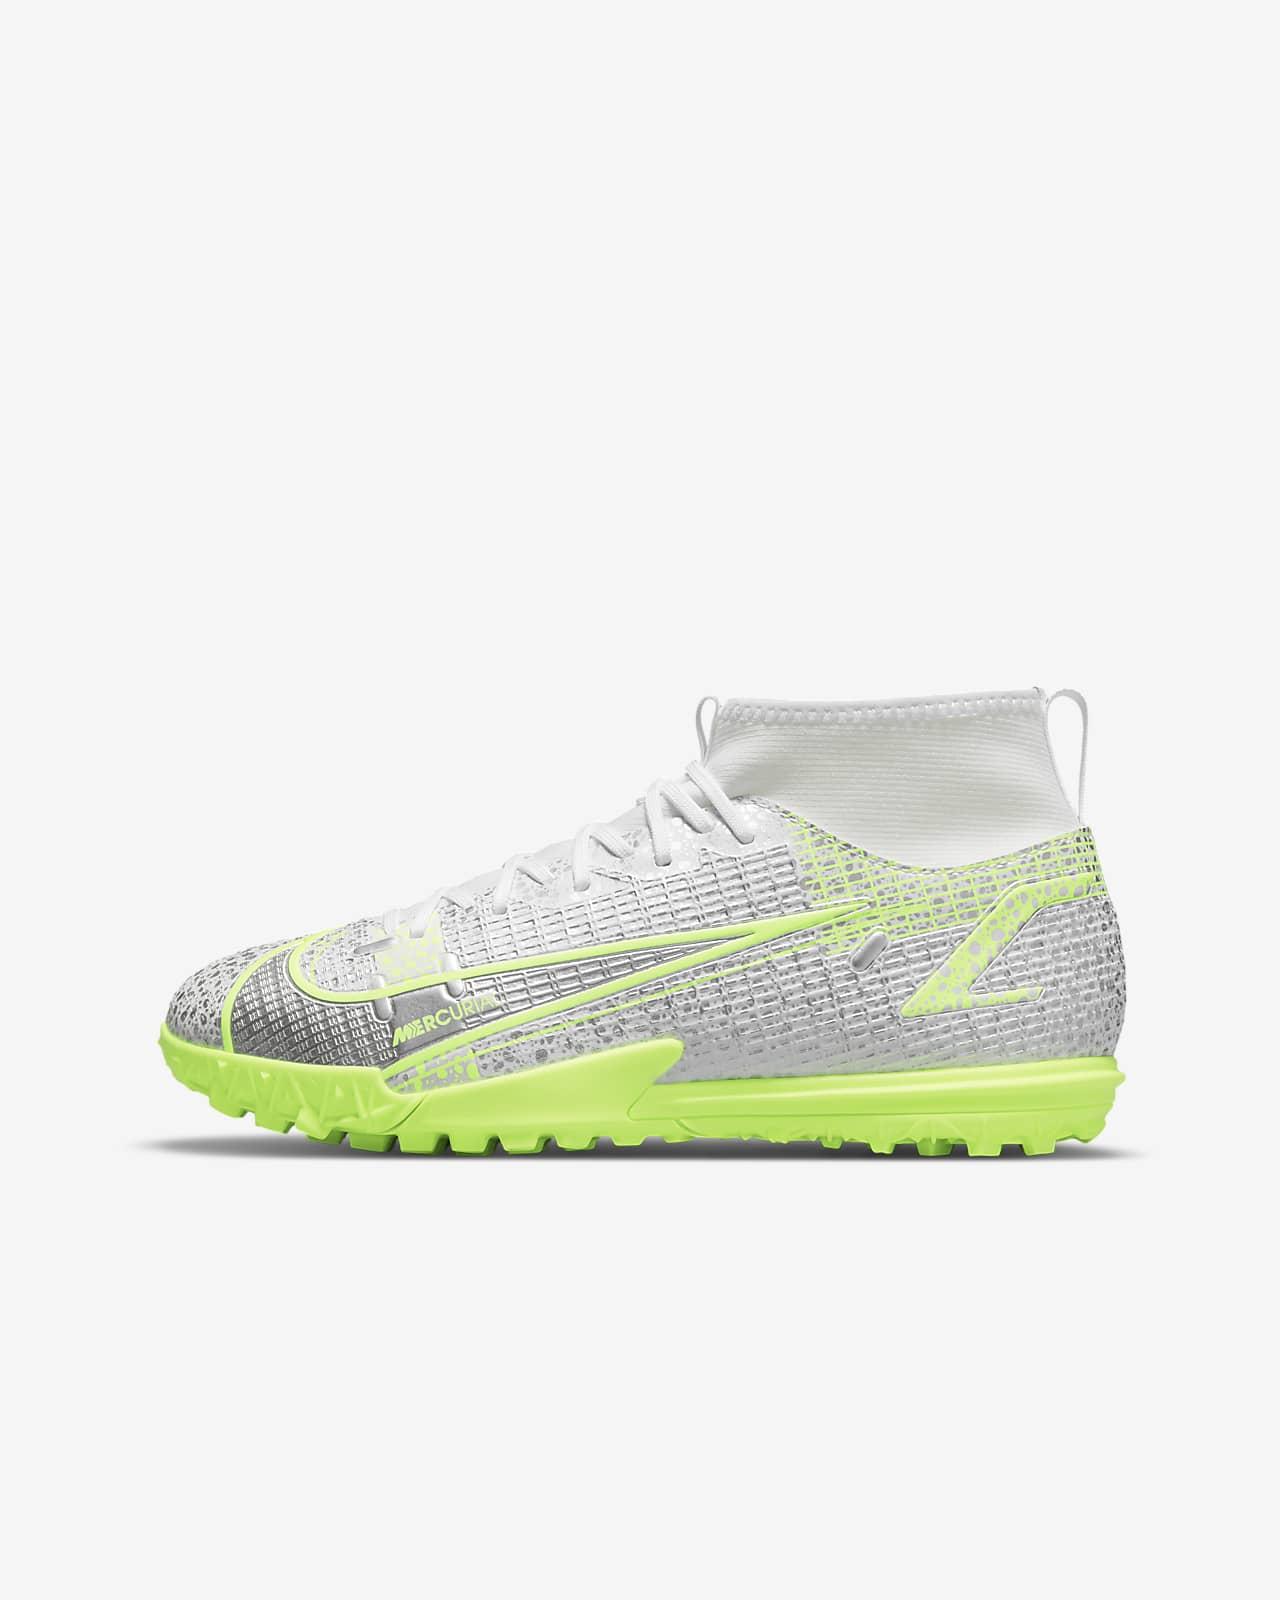 Scarpa da calcio per erba artificiale/sintetica Nike Jr. Mercurial Superfly 8 Academy TF - Bambini/Ragazzi